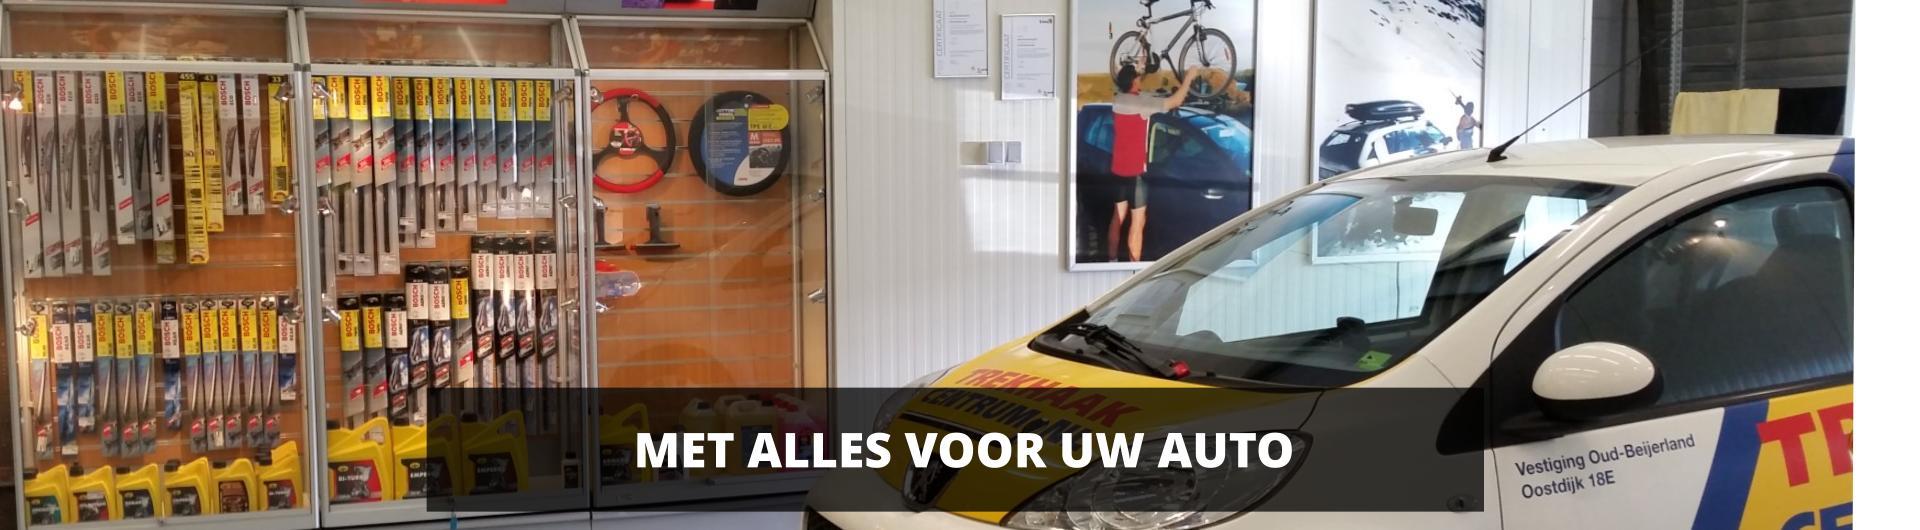 automaterialen kopen